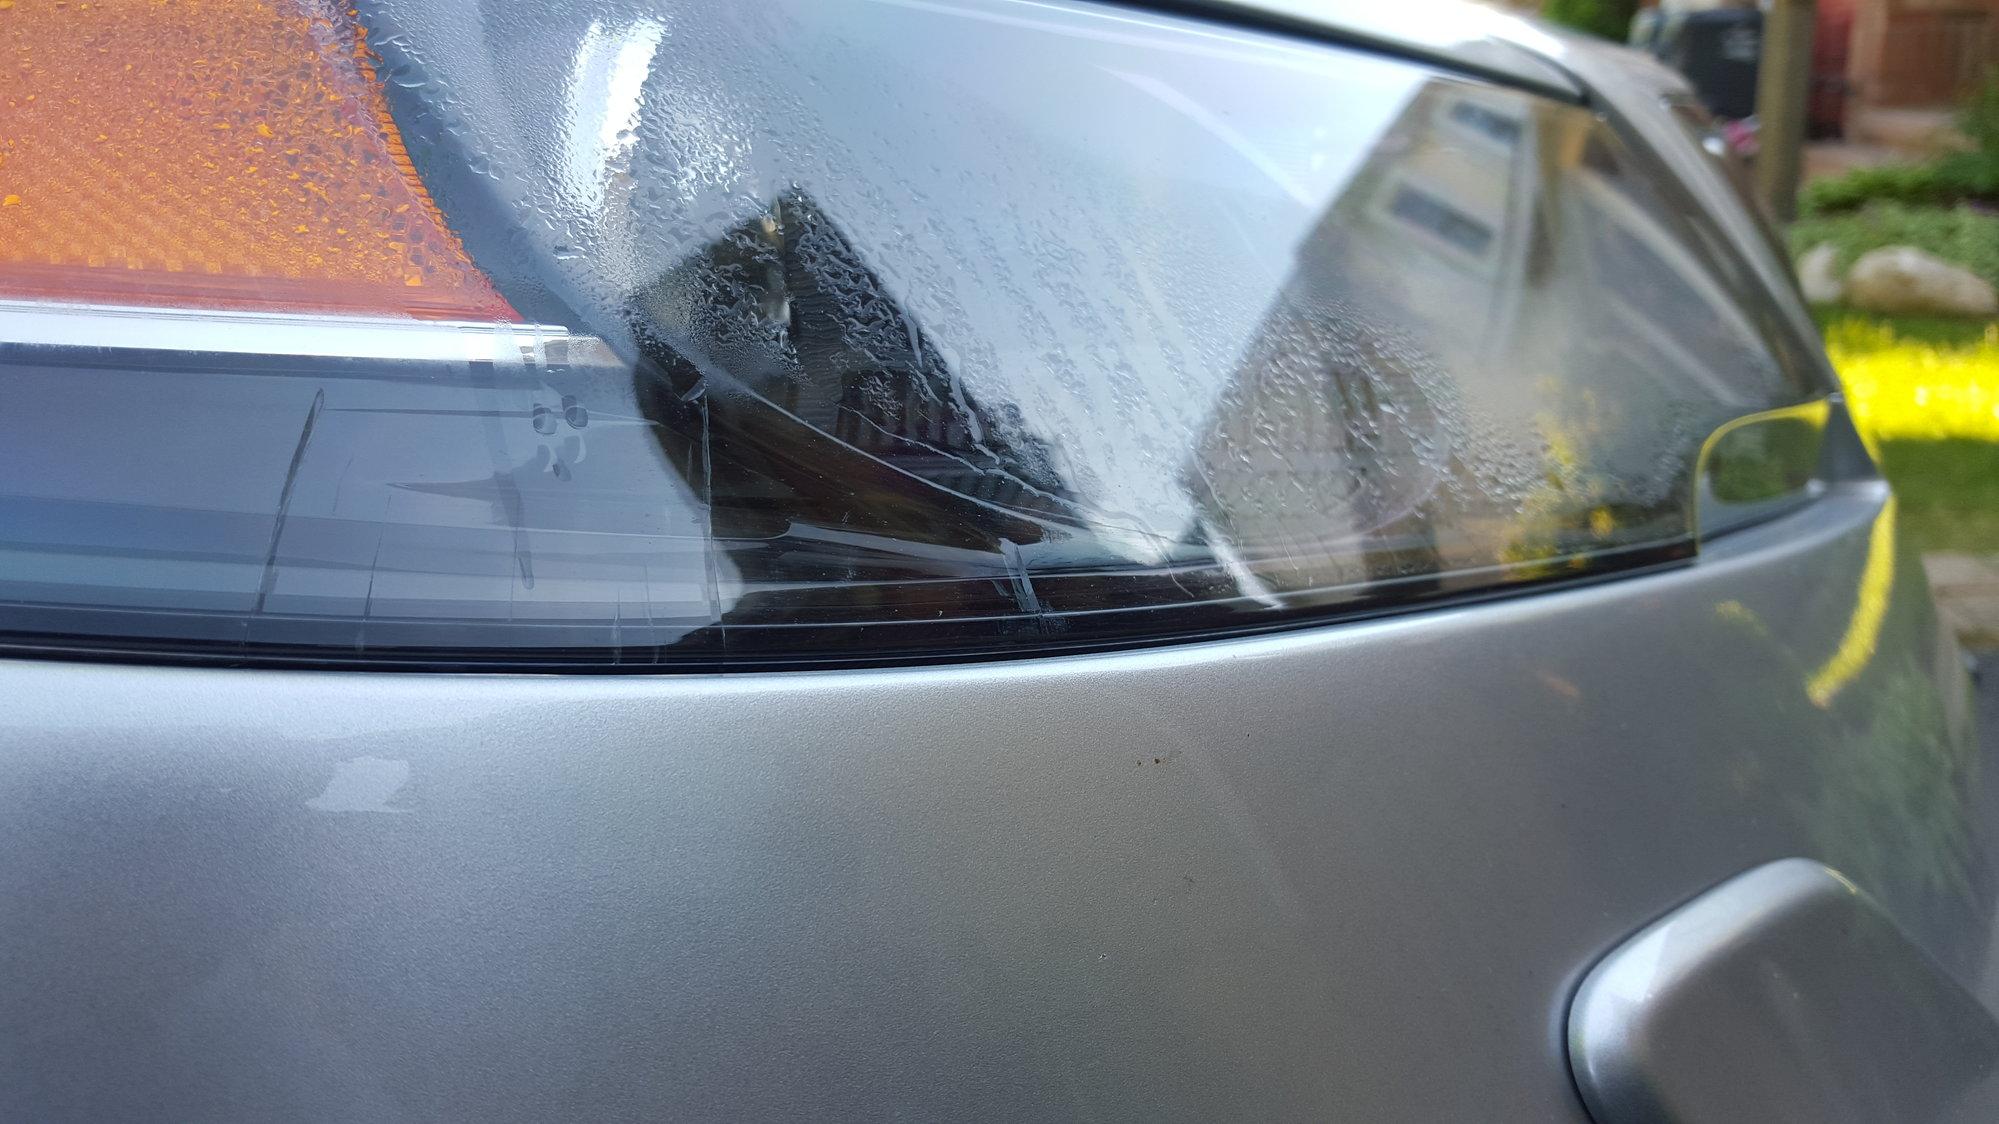 Cracks on headlight housing - AcuraZine - Acura Enthusiast